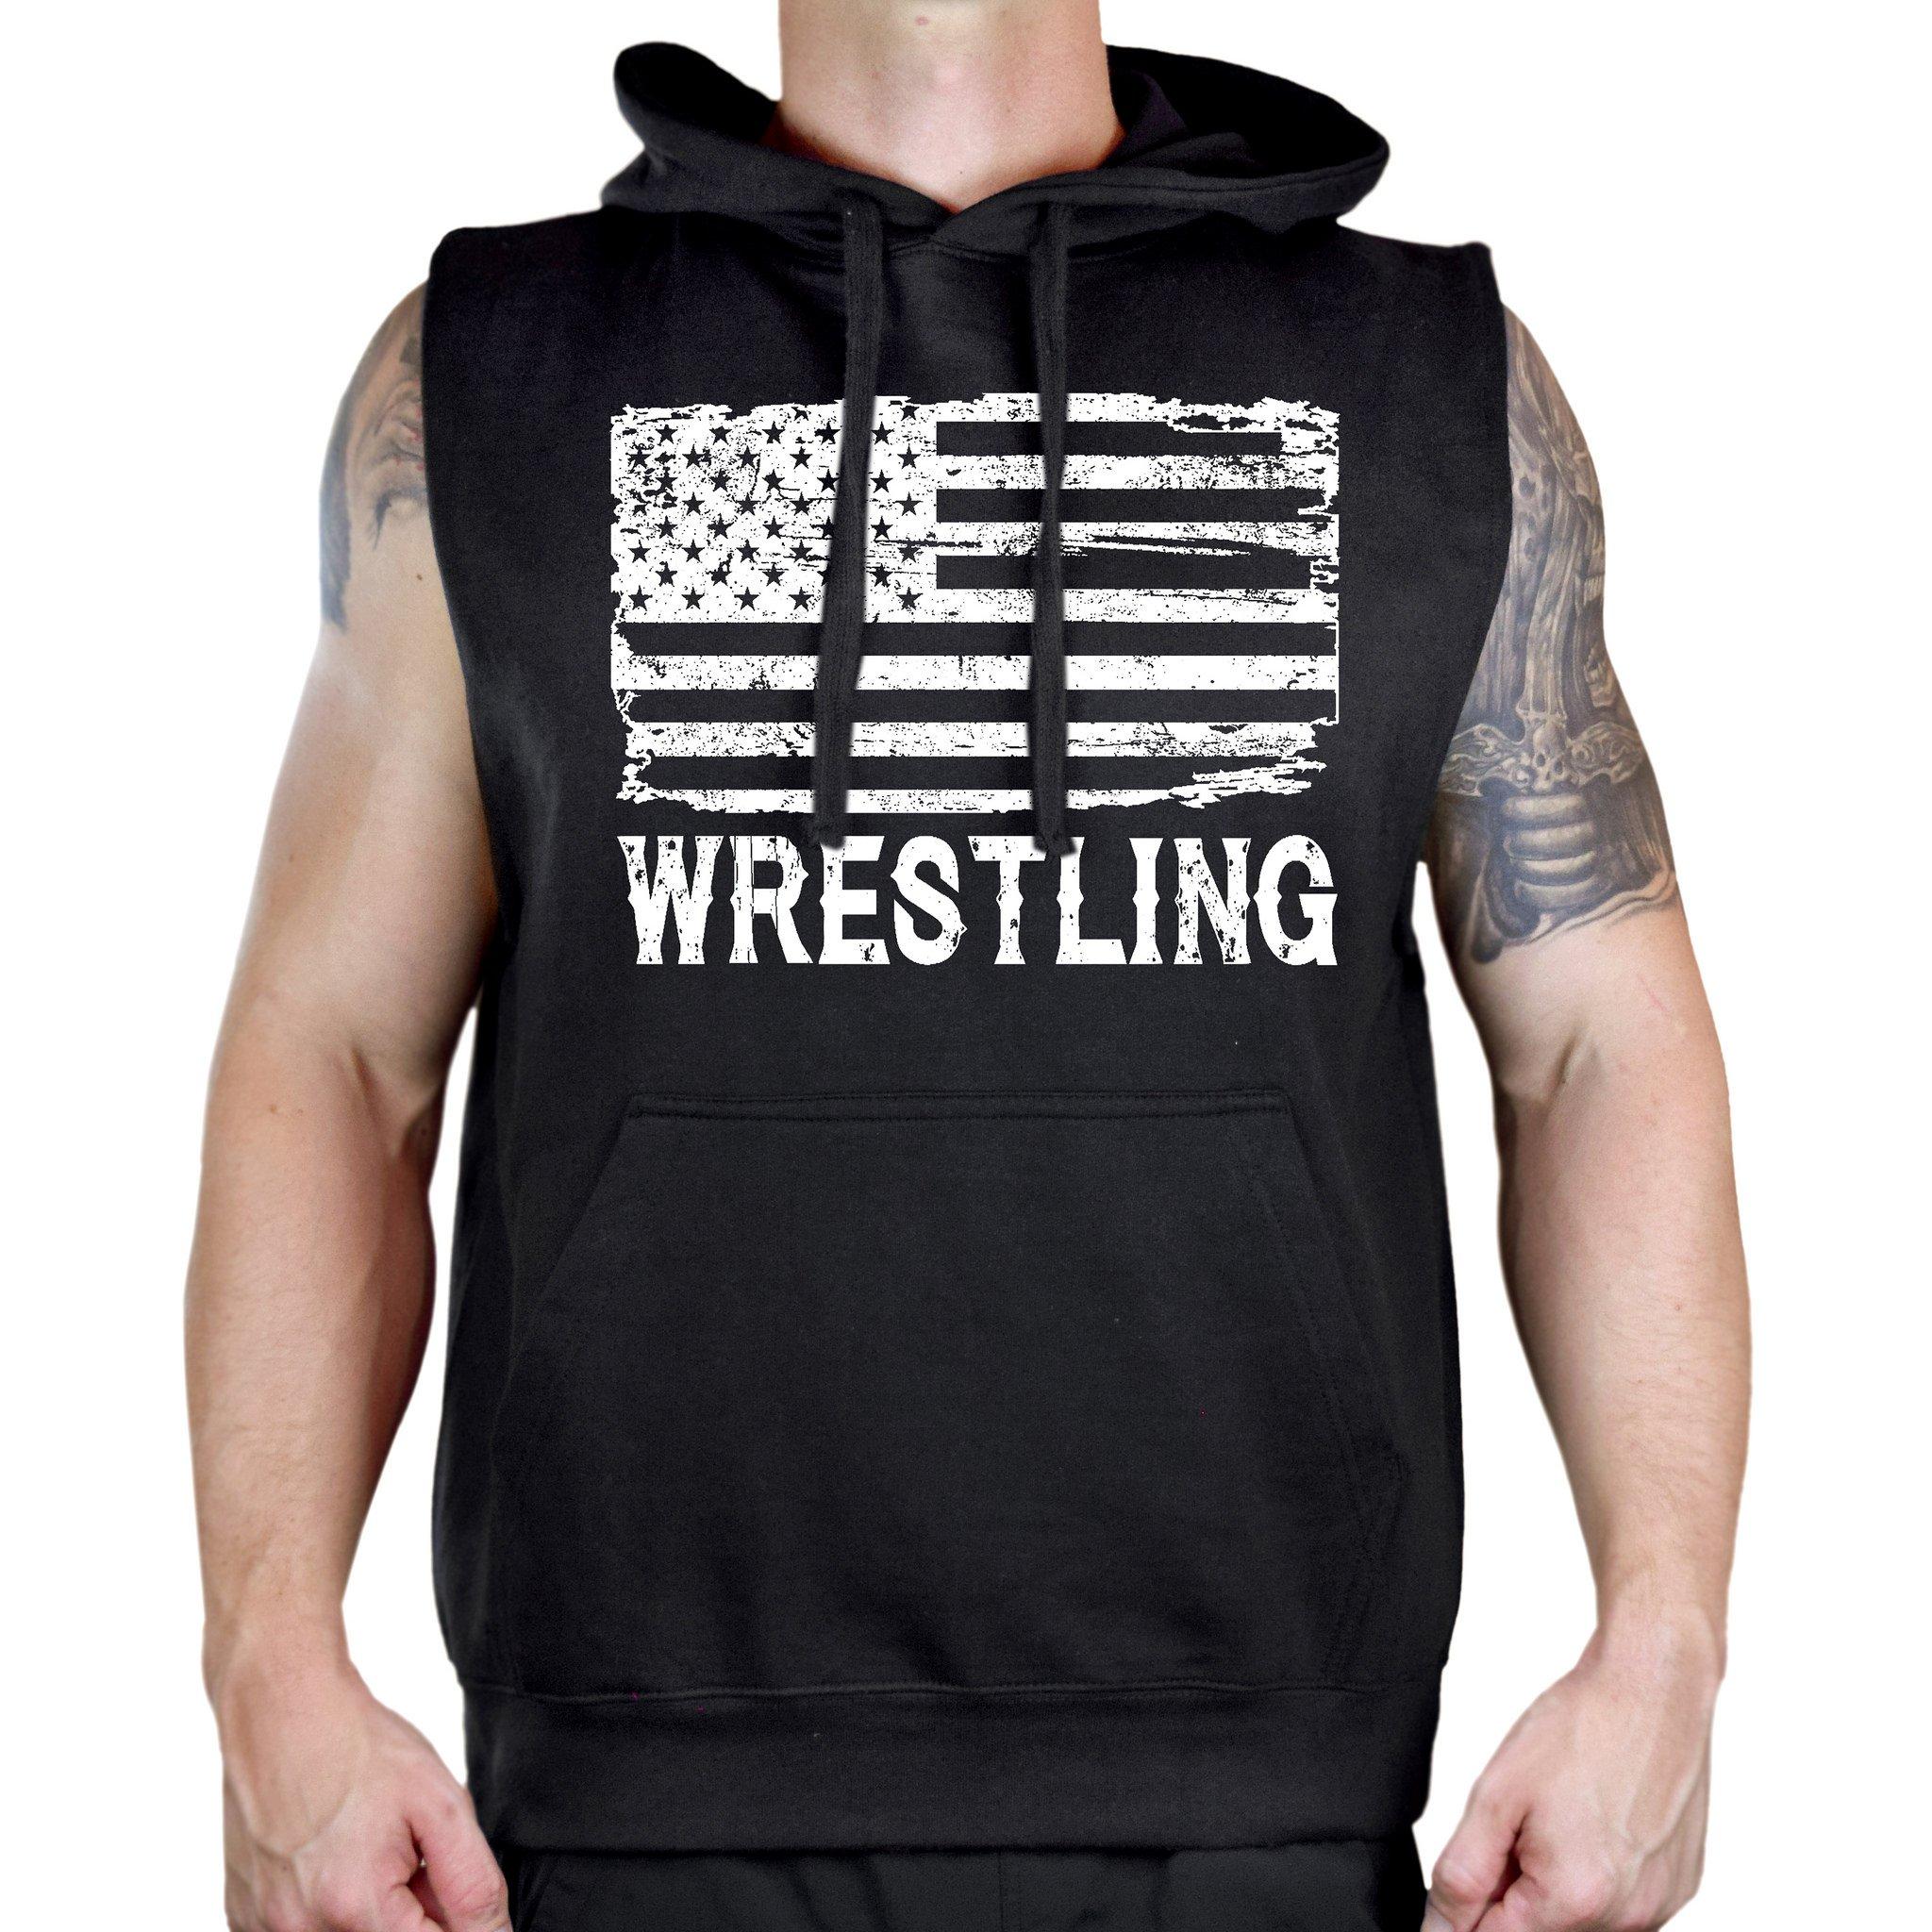 Men's Wrestling American Flag Sleeveless Vest Hoodie 4X-Large Black by Interstate Apparel